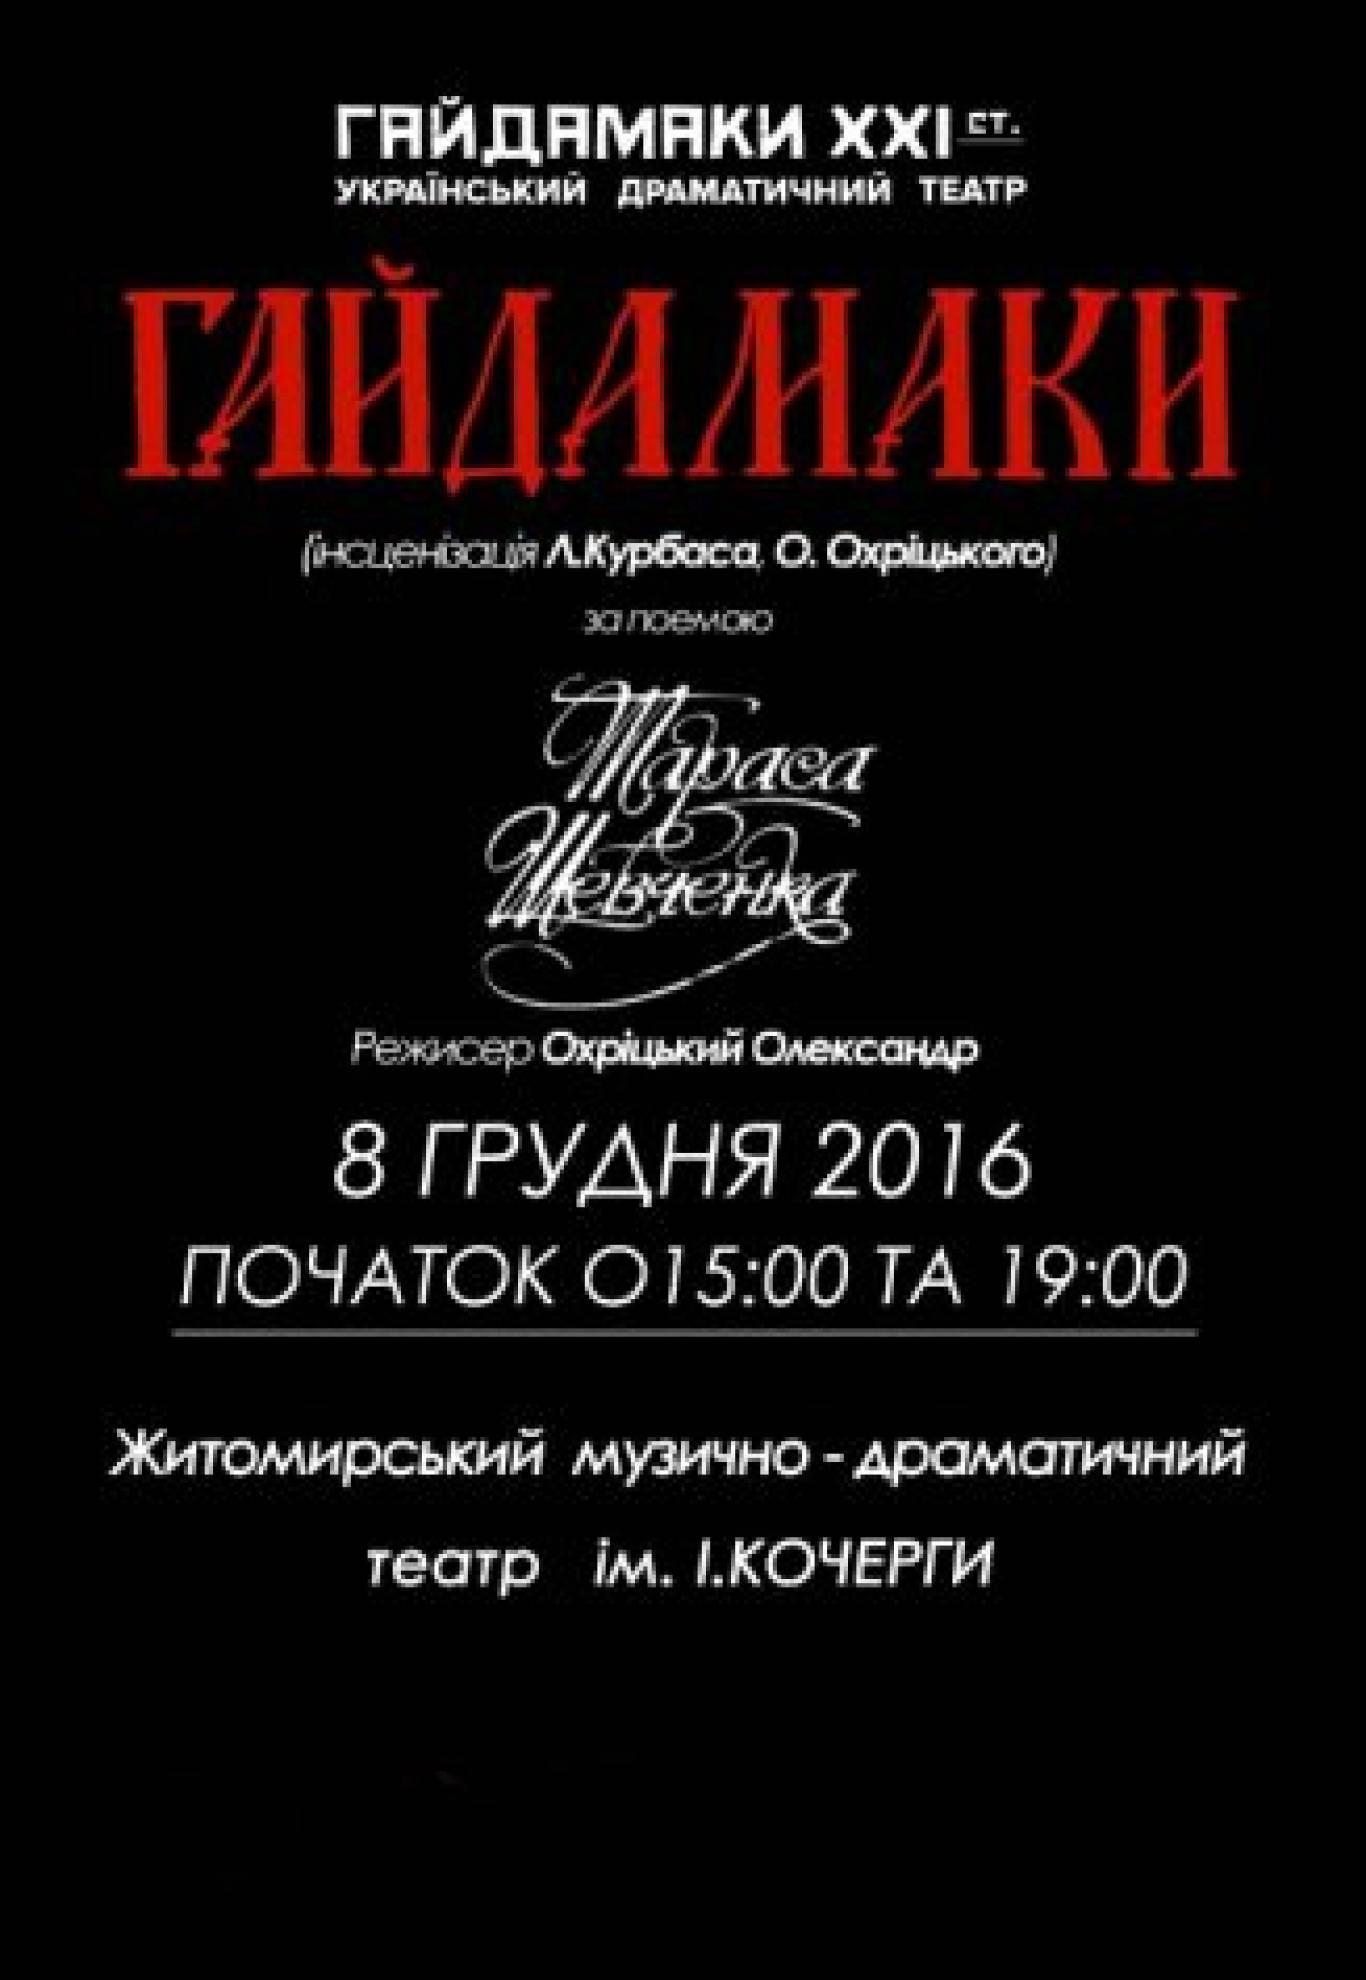 Гайдамаки, гастролі Київського театру